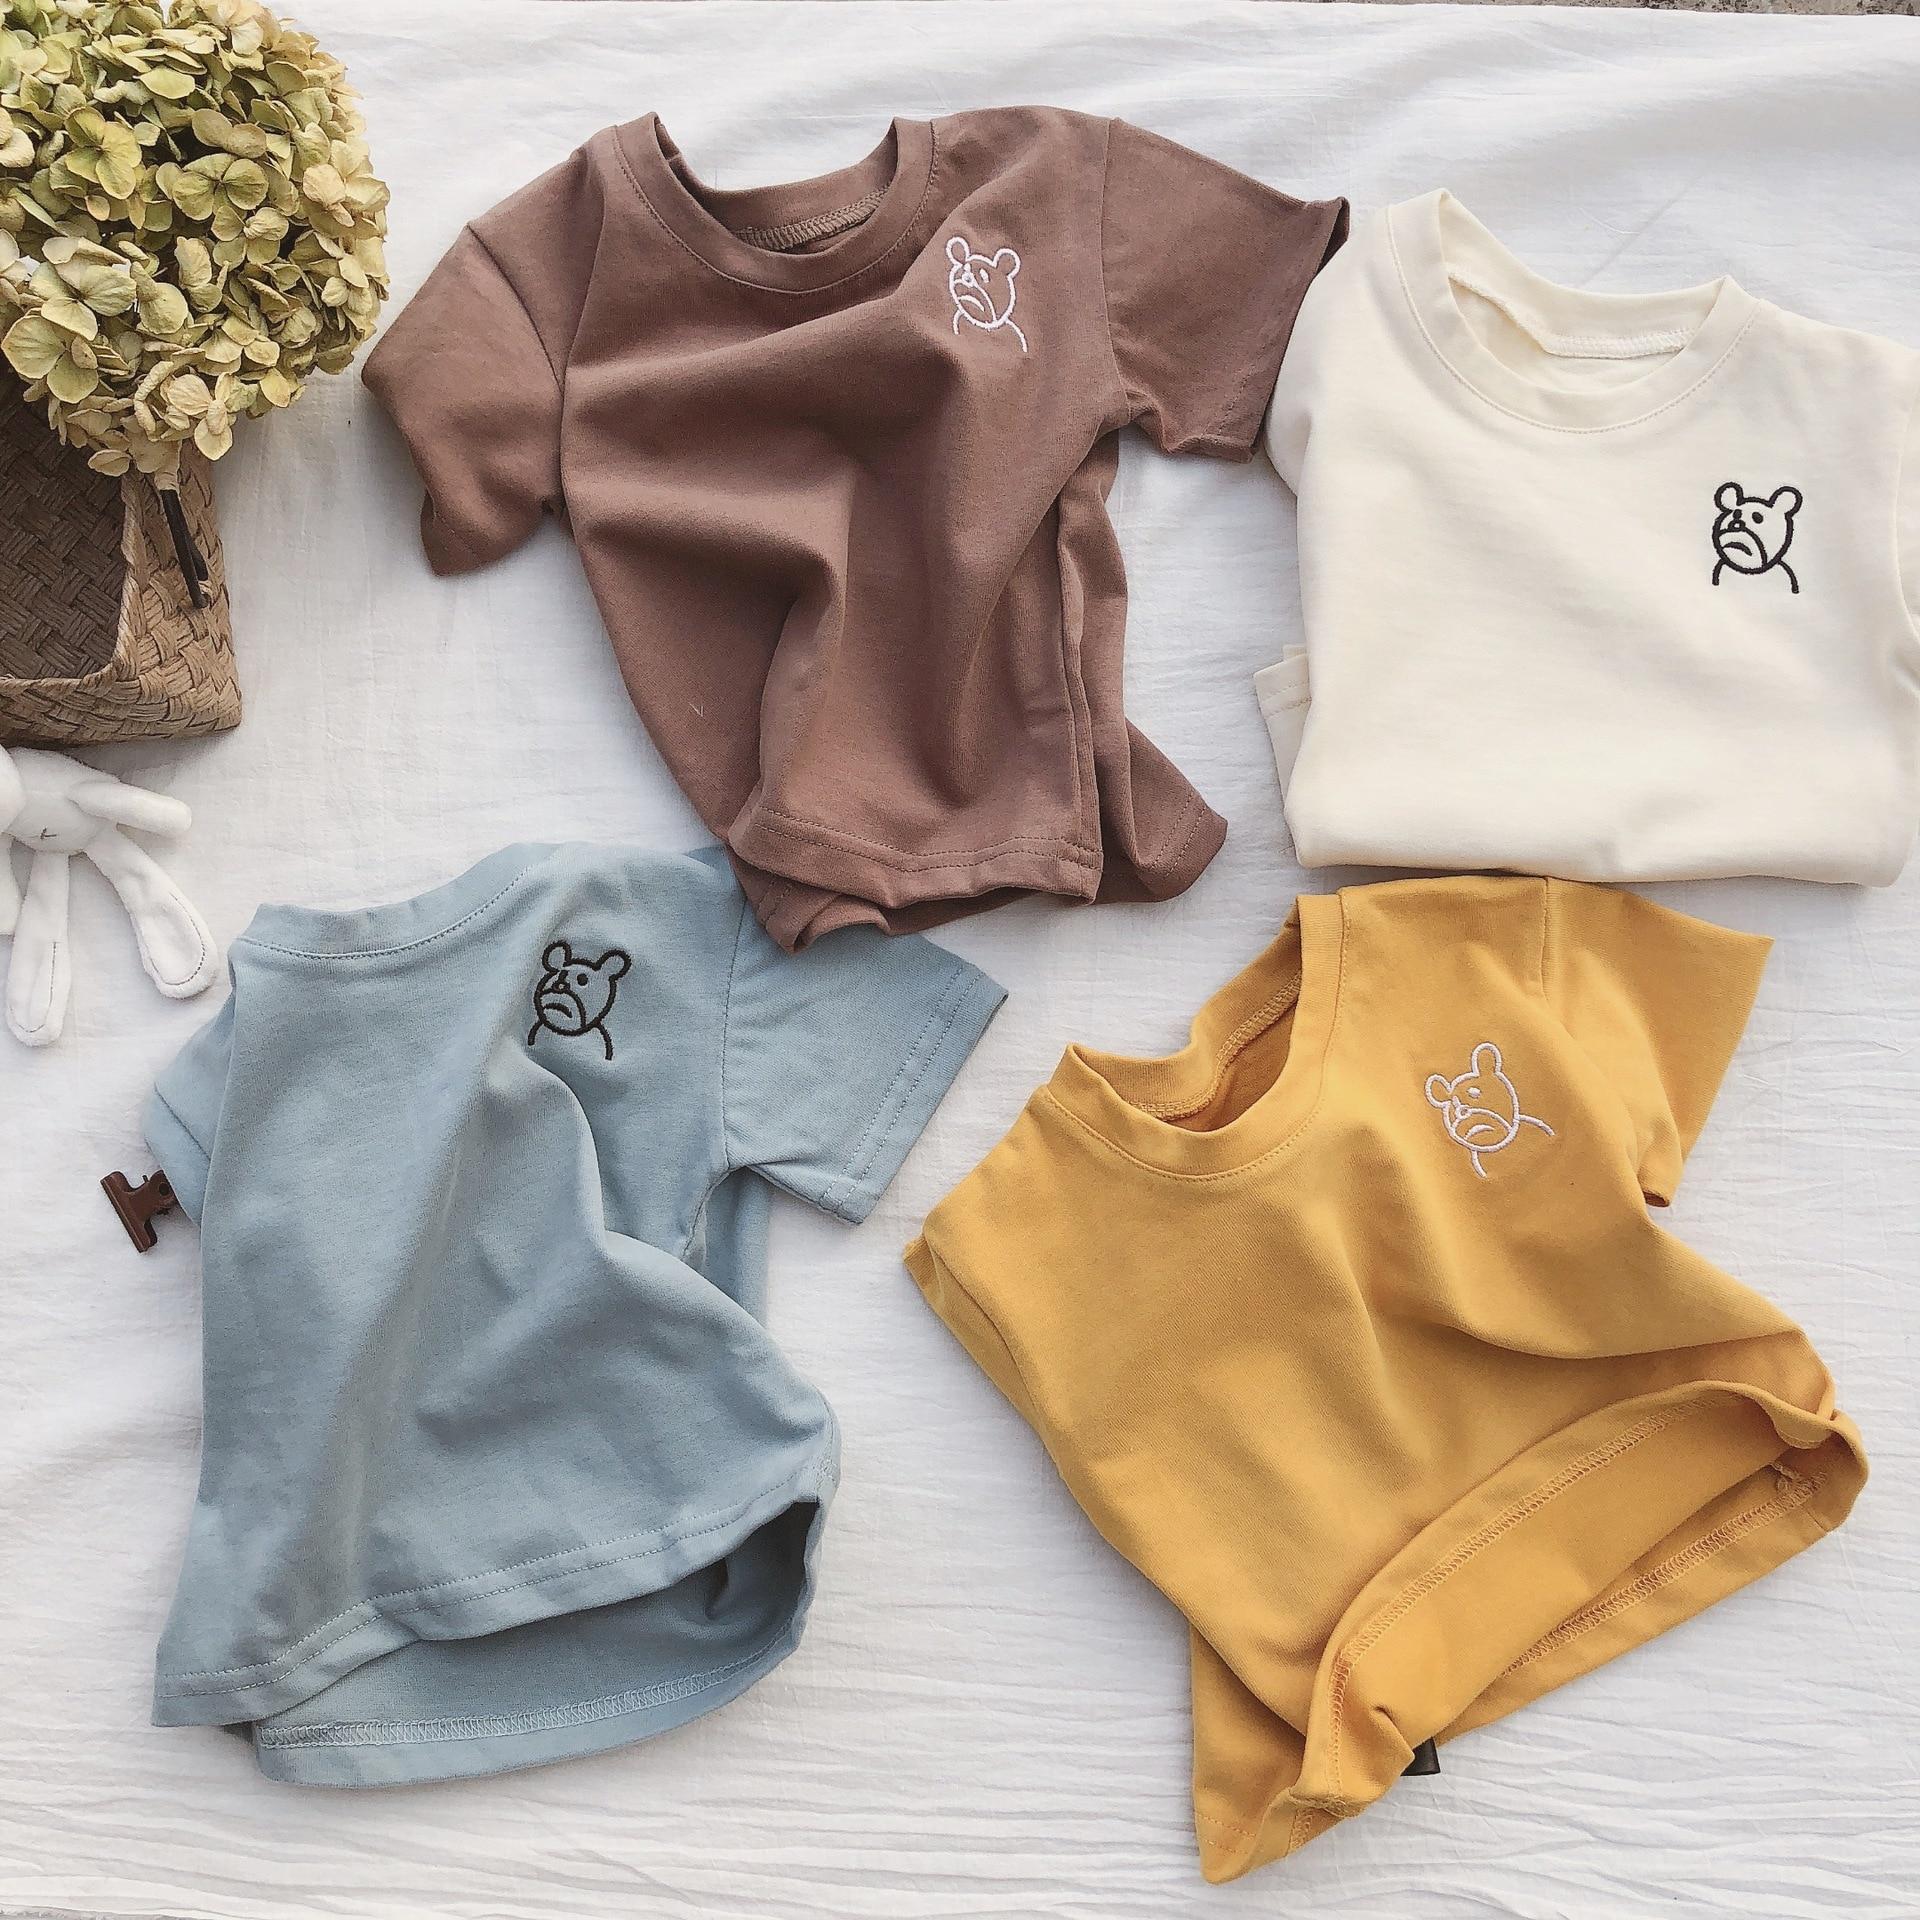 Camiseta de manga corta bordada de oso de dibujos animados de verano 2019 para niños de estilo coreano, camisetas casuales de algodón para niñas